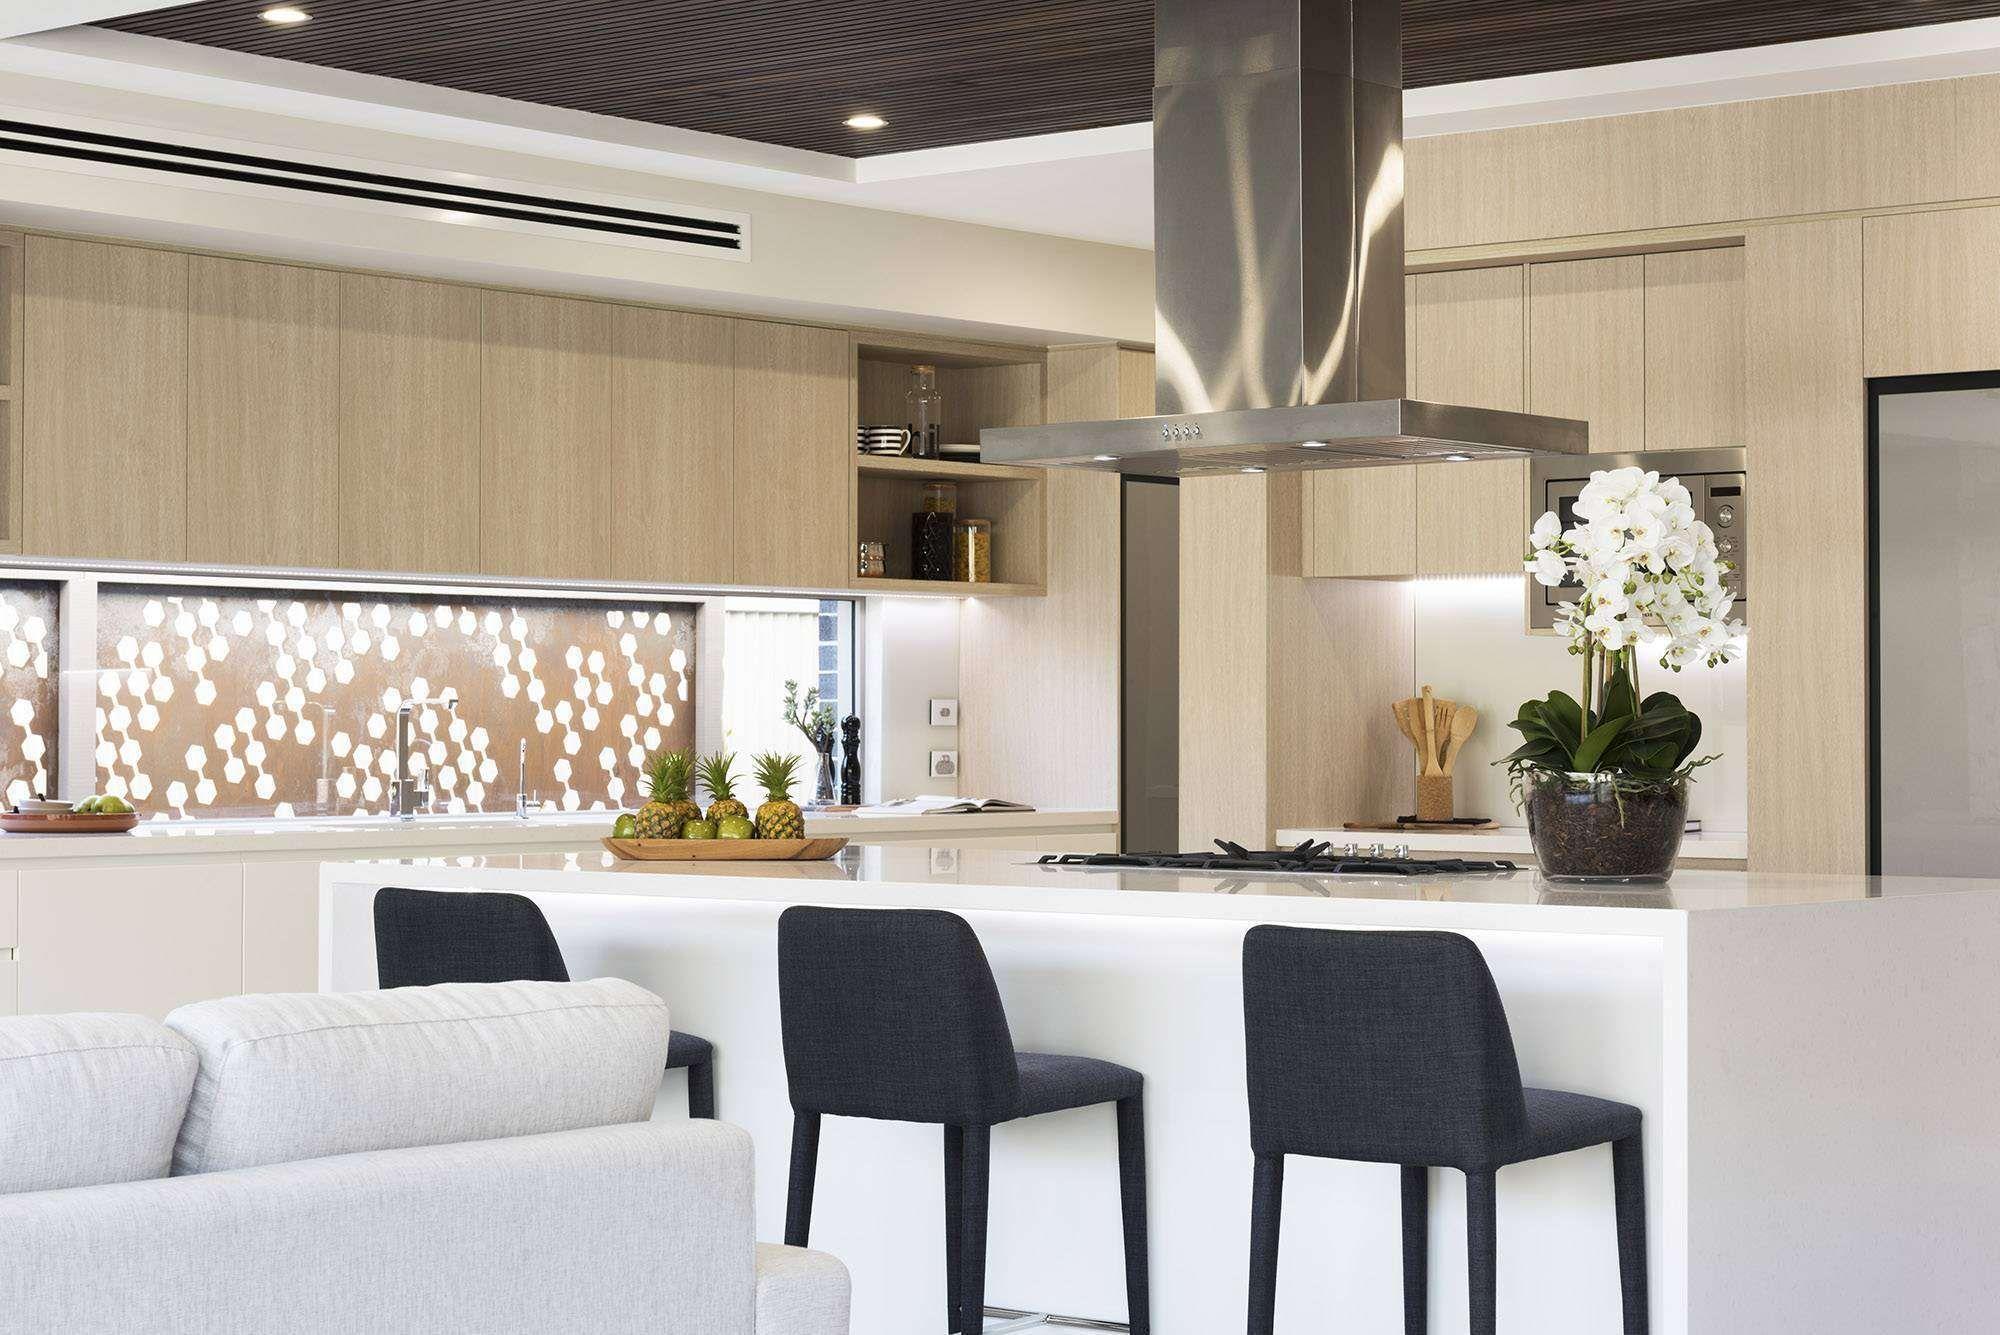 Majestic - Wisdom Homes in 2020 | Closet design layout ...